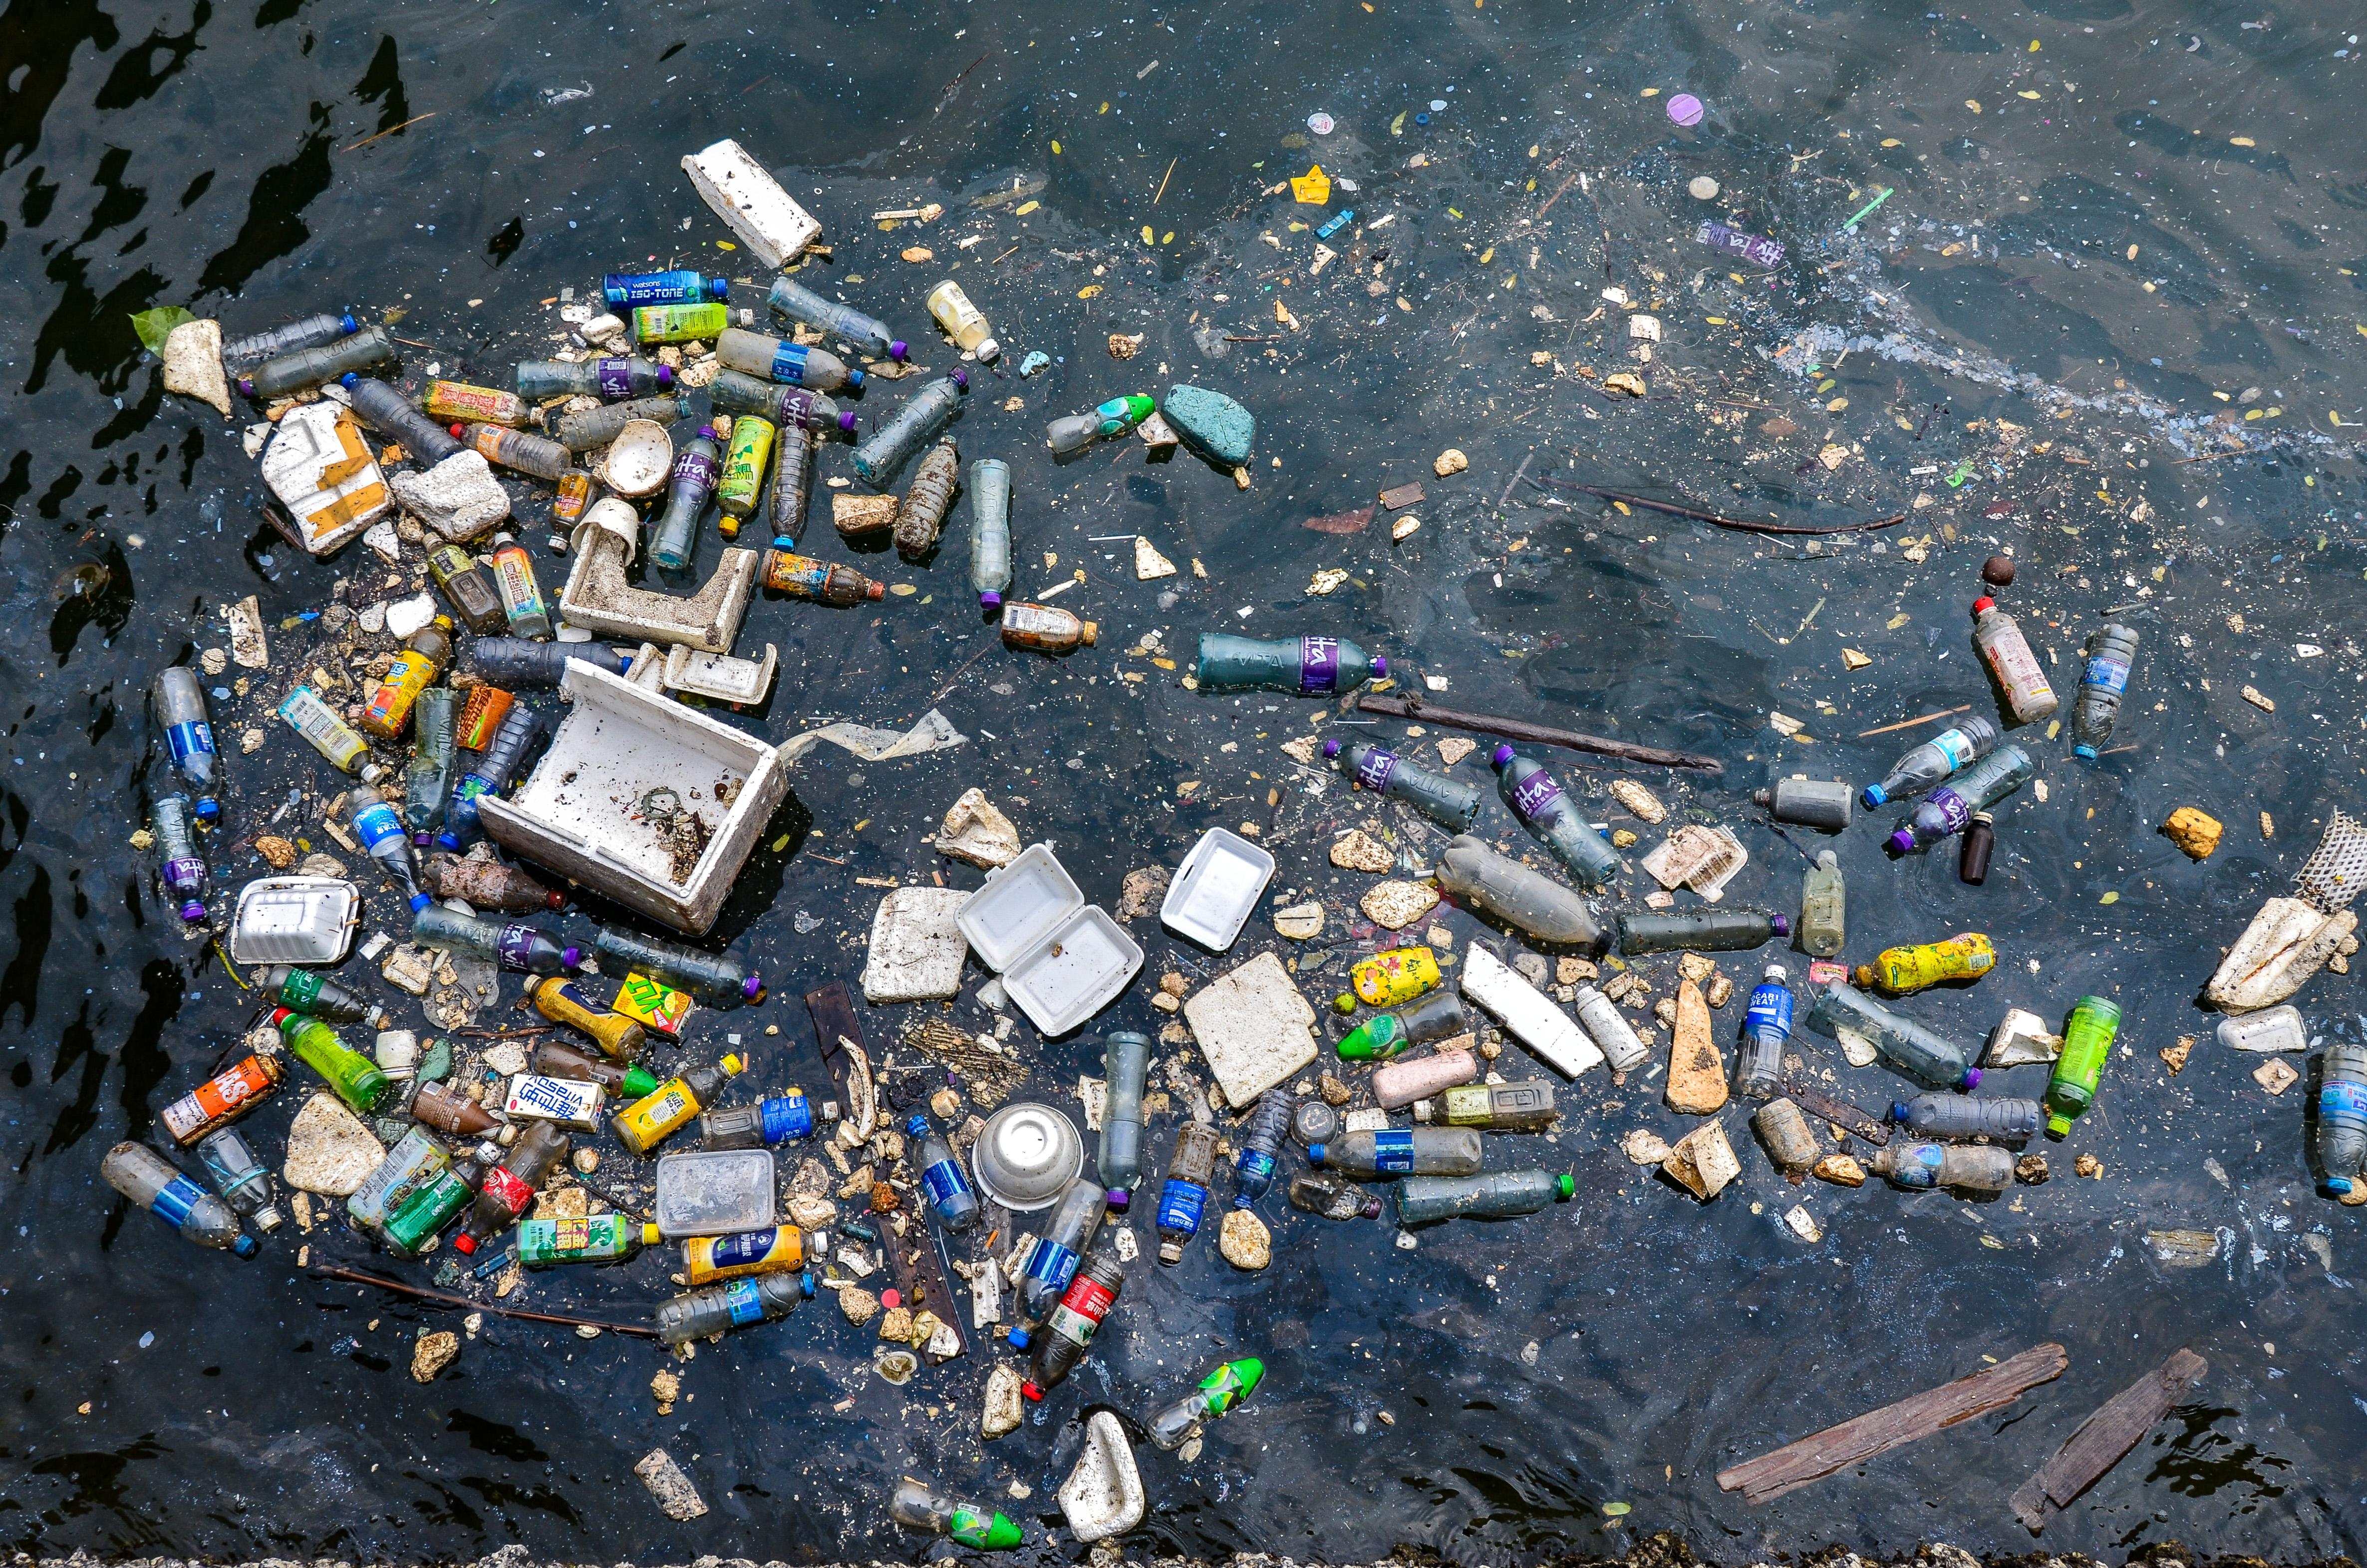 Floating plastic and styrofoam trash polluting a corner of...